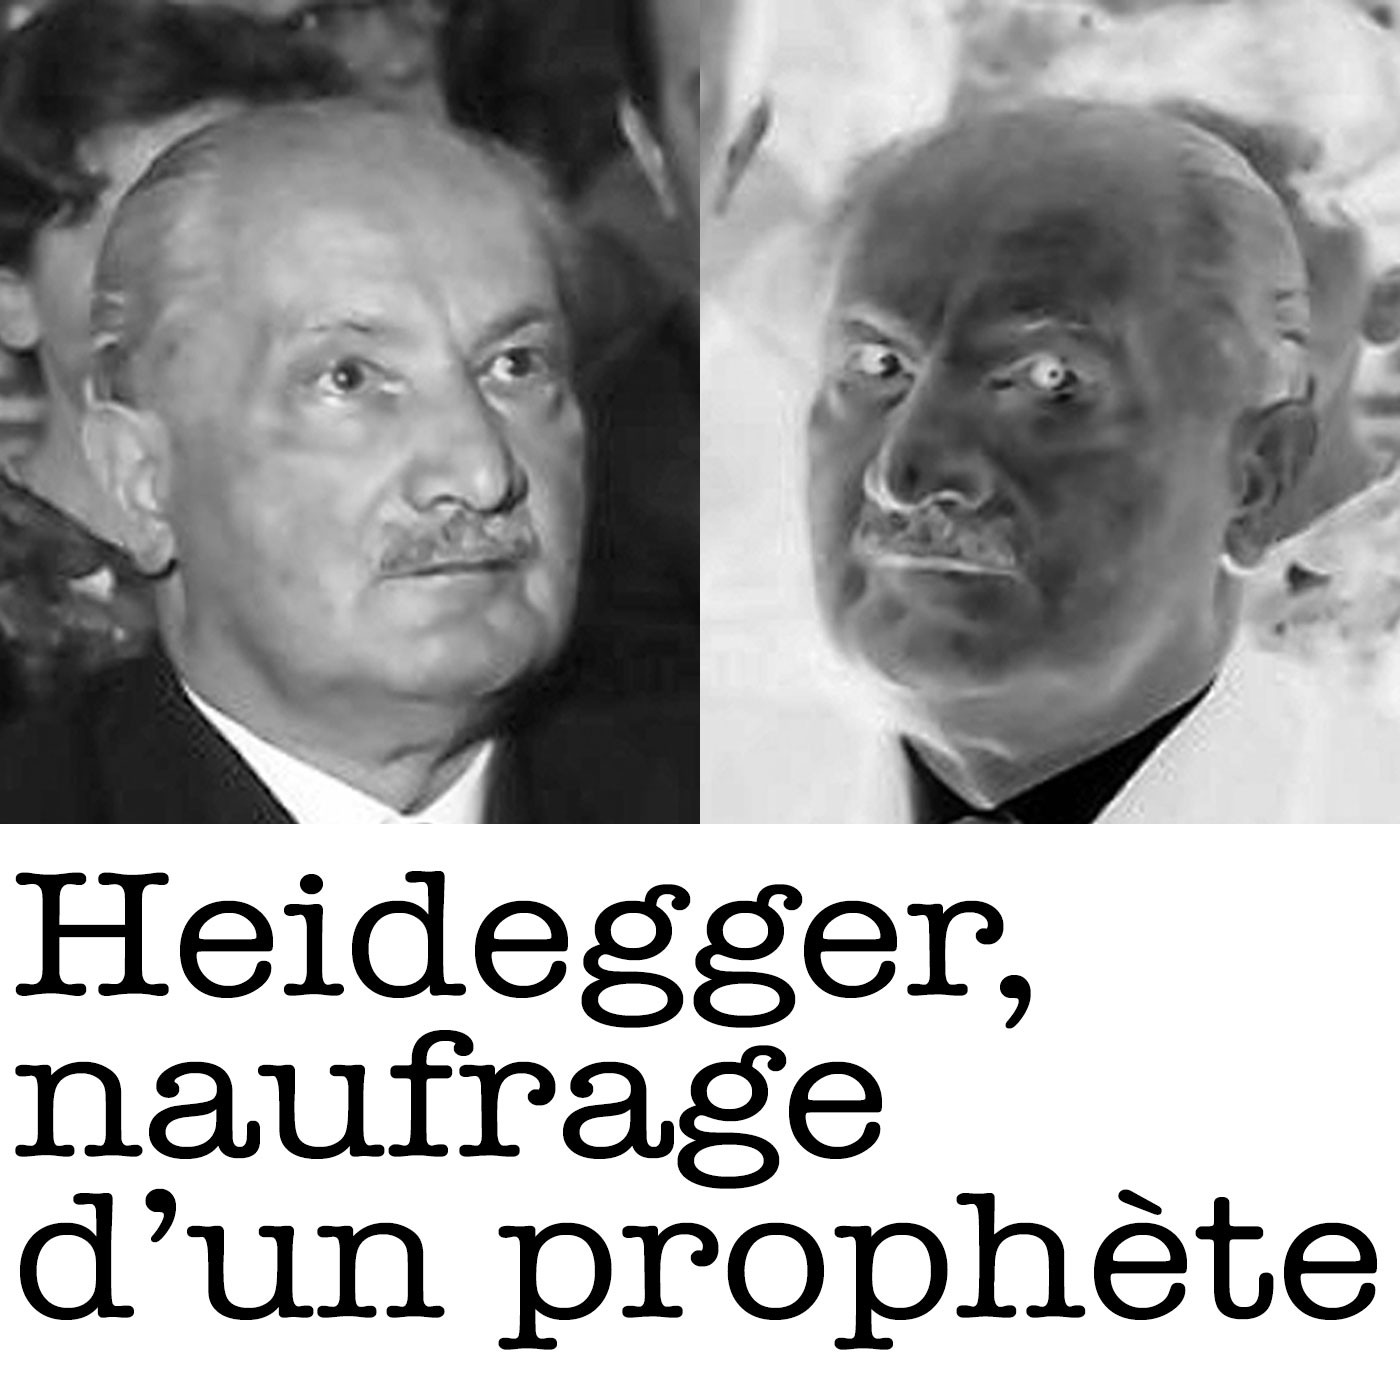 Heiddegger, naufrage d'un prophète